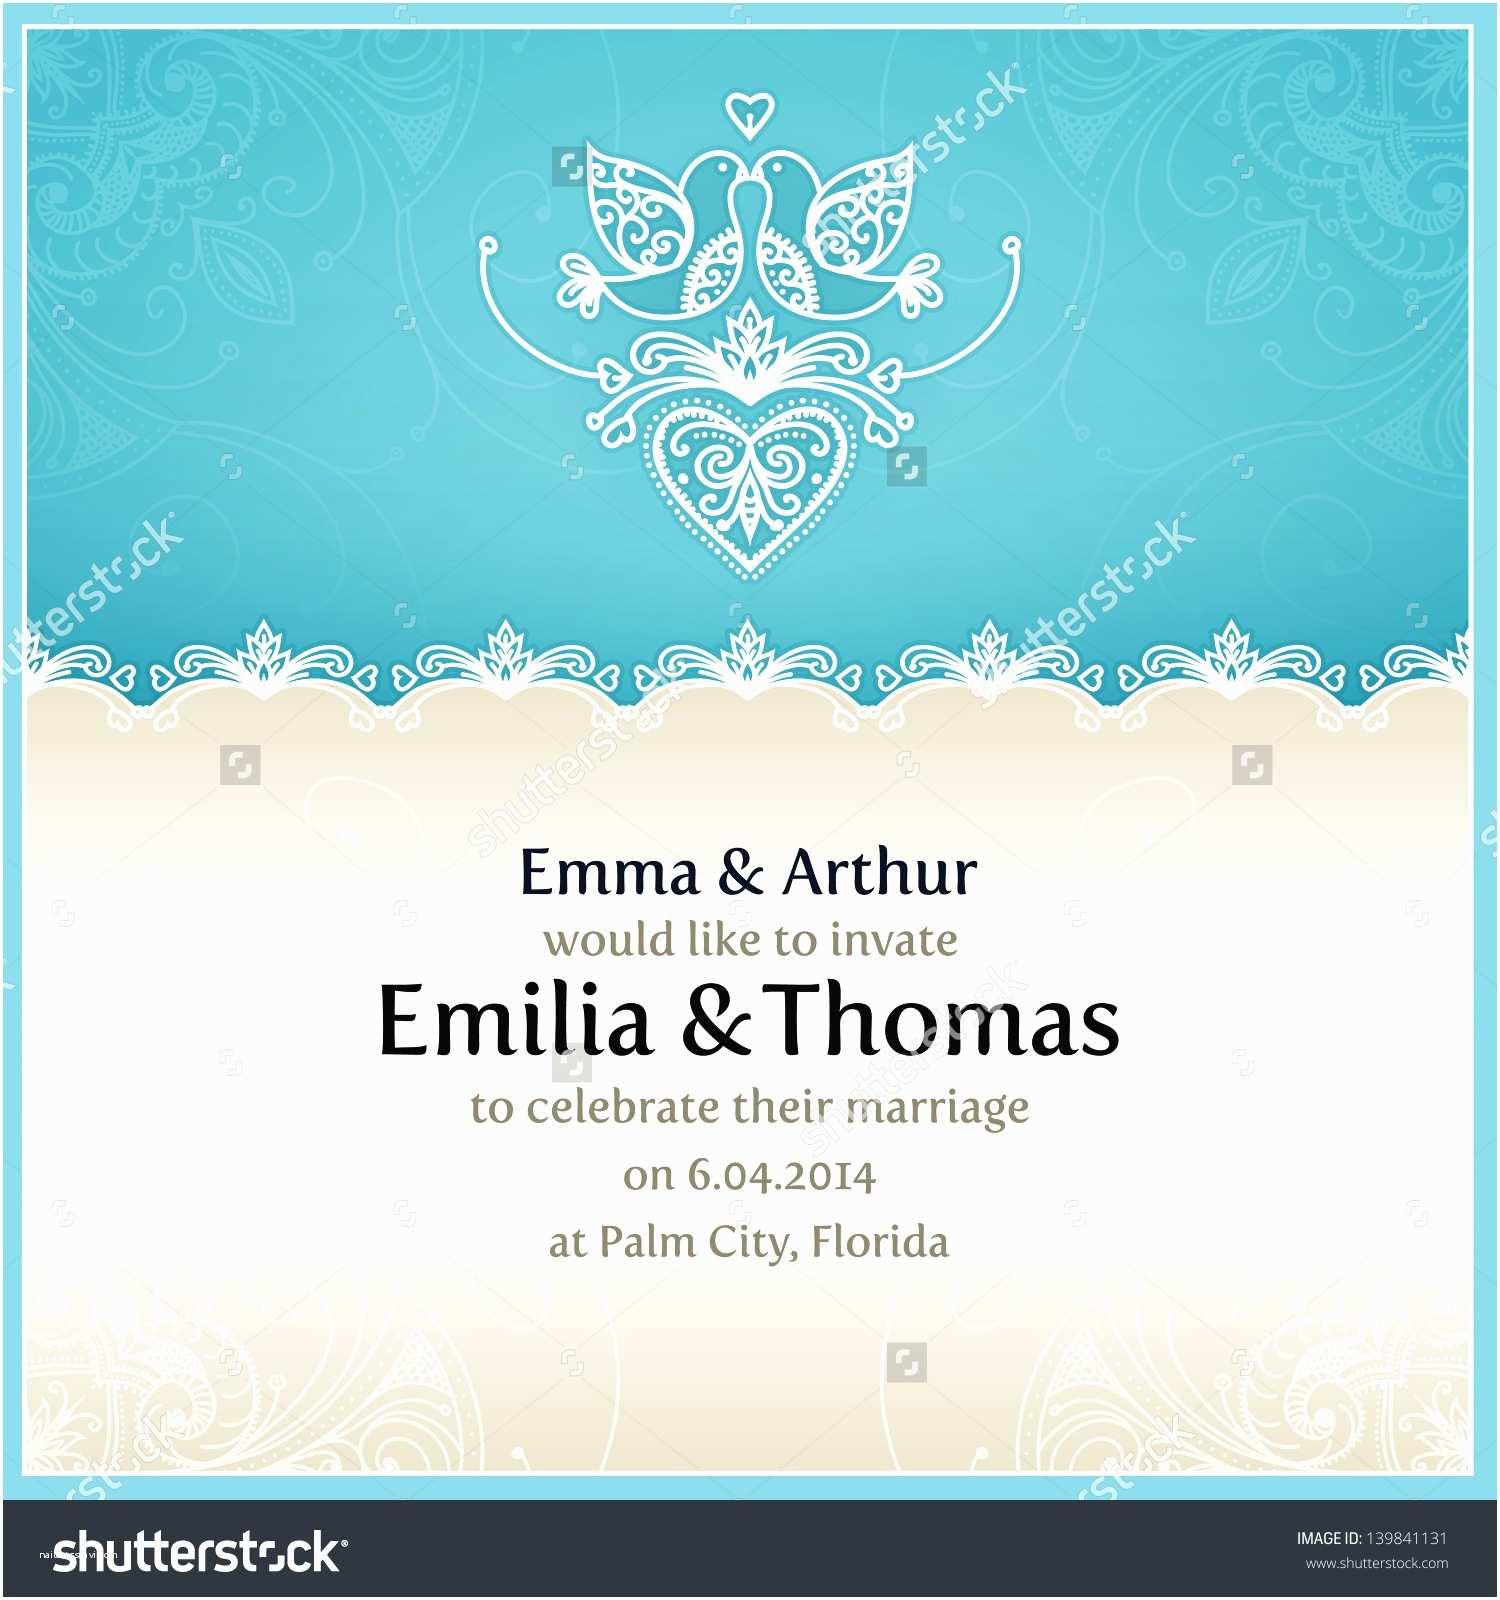 Design Wedding Invitations Wedding Invitation Design